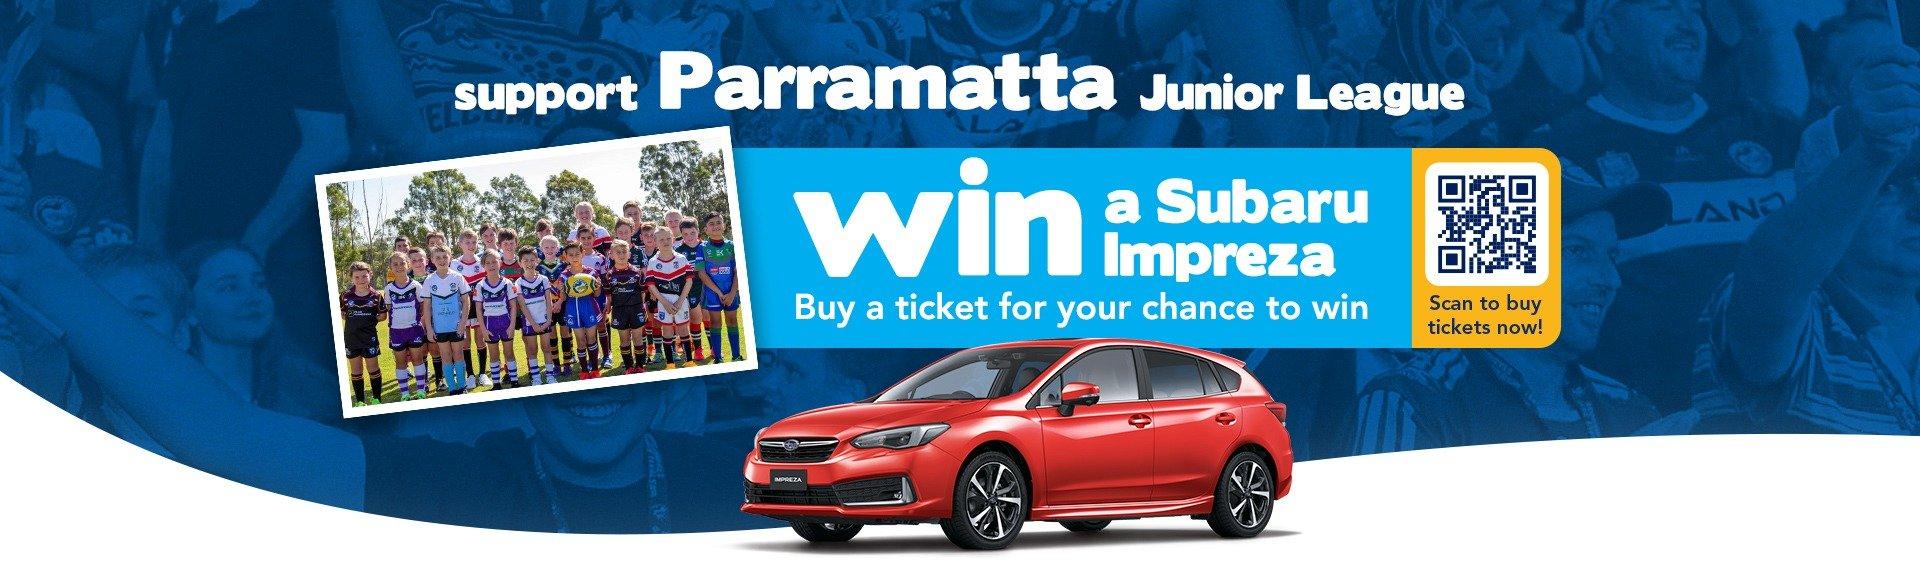 Subaru Parramatta Raffle